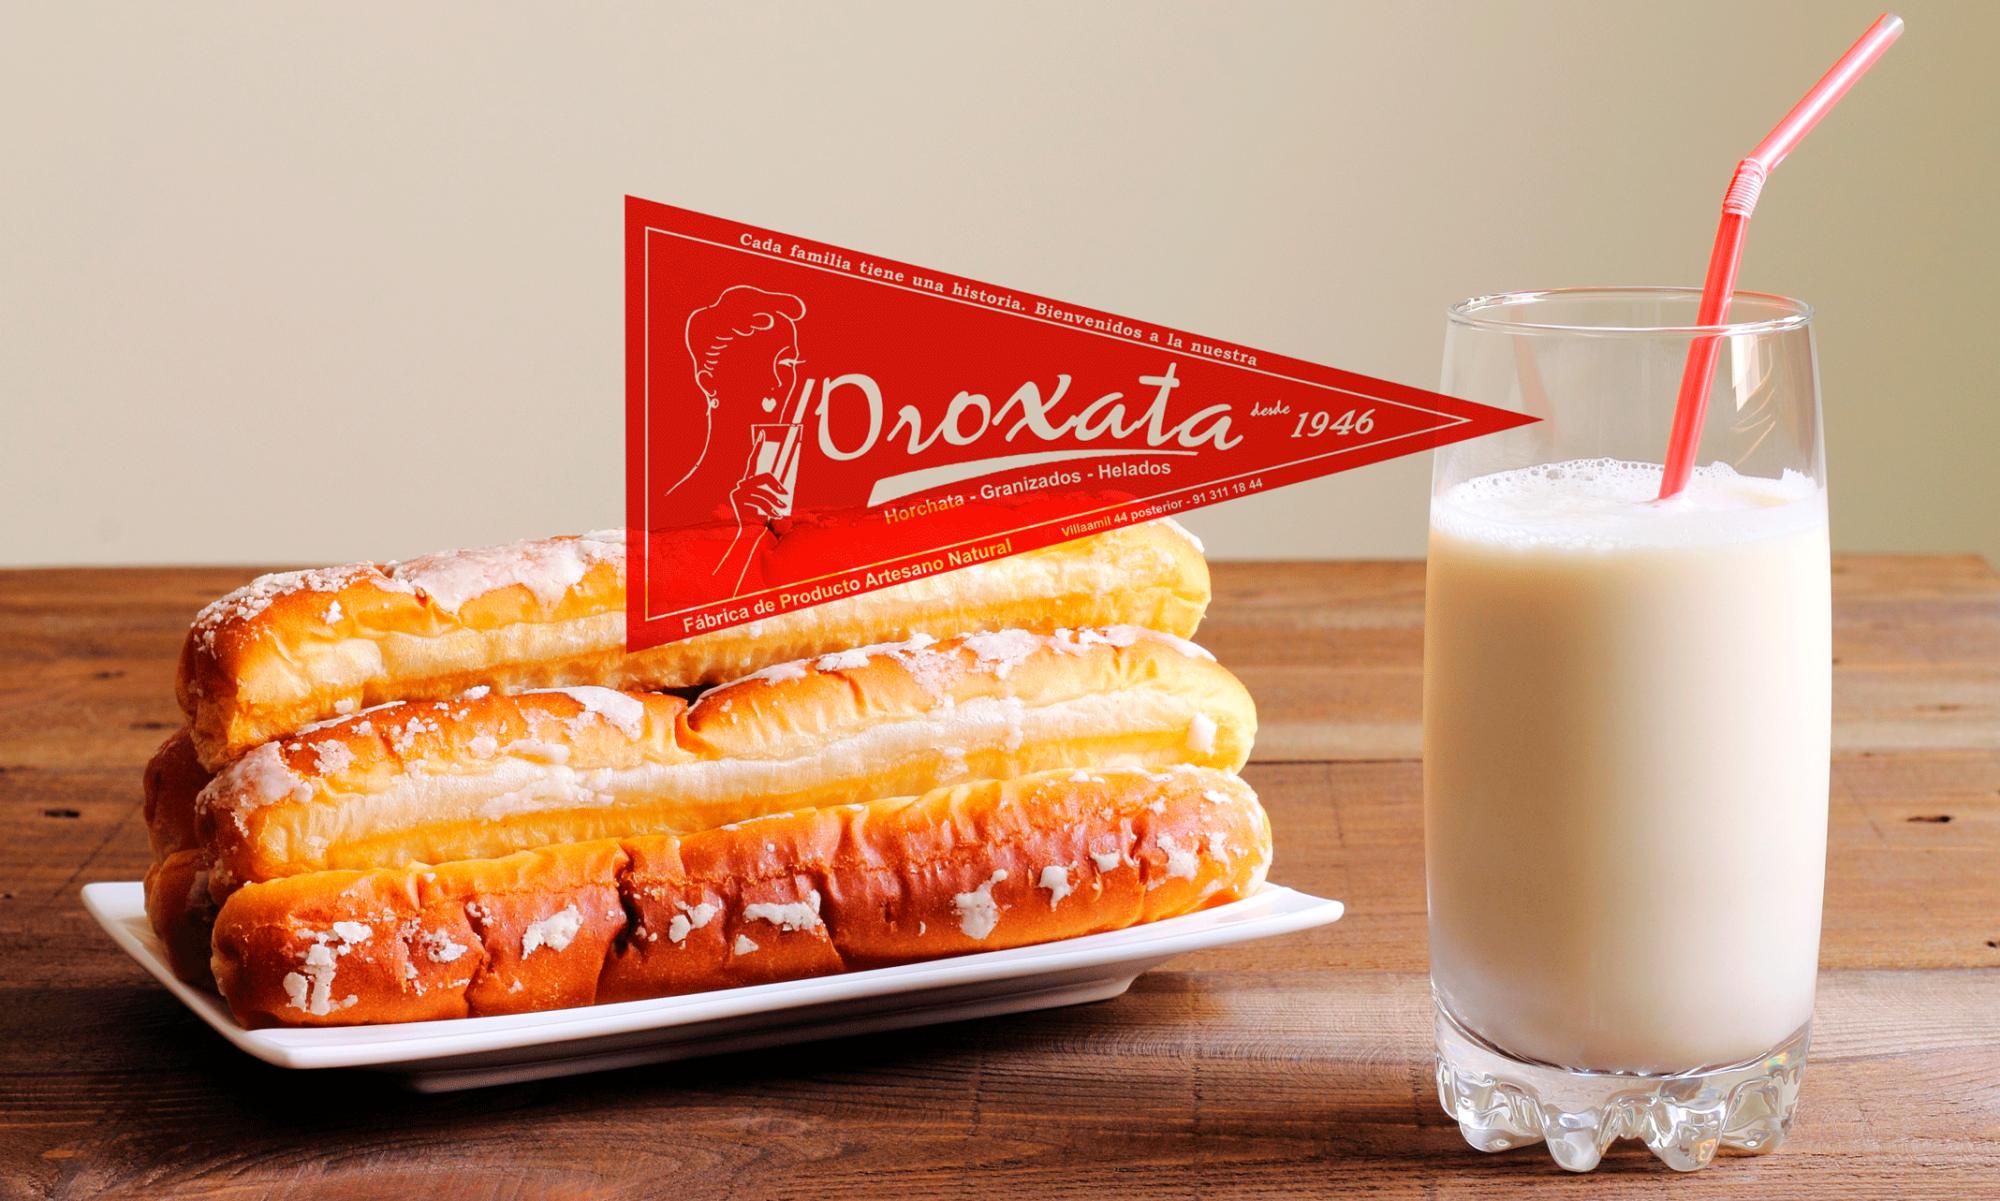 Oroxata - mejores horchatas Madrid